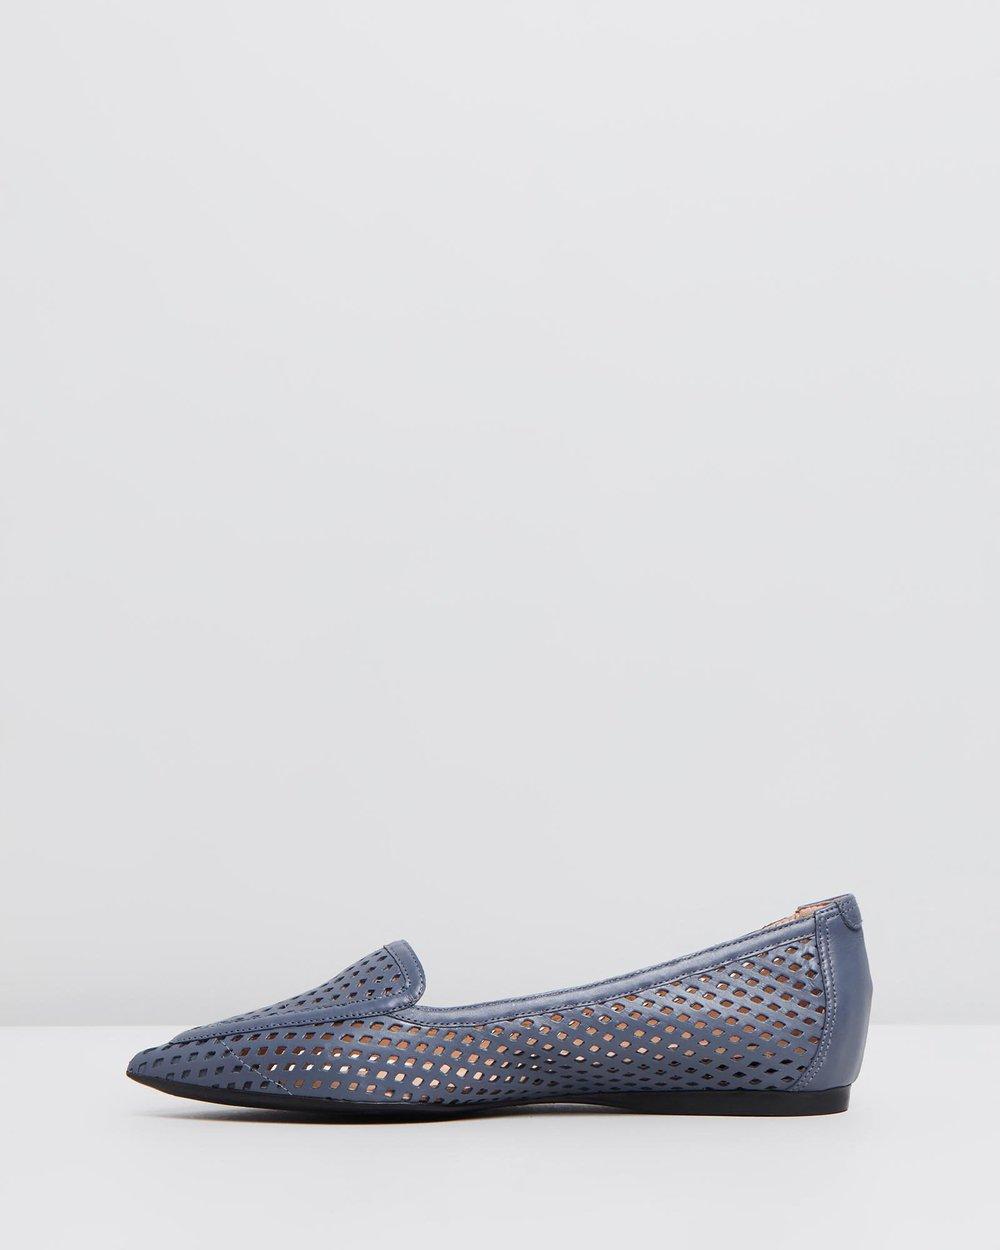 Amani Flats - Siena Blue